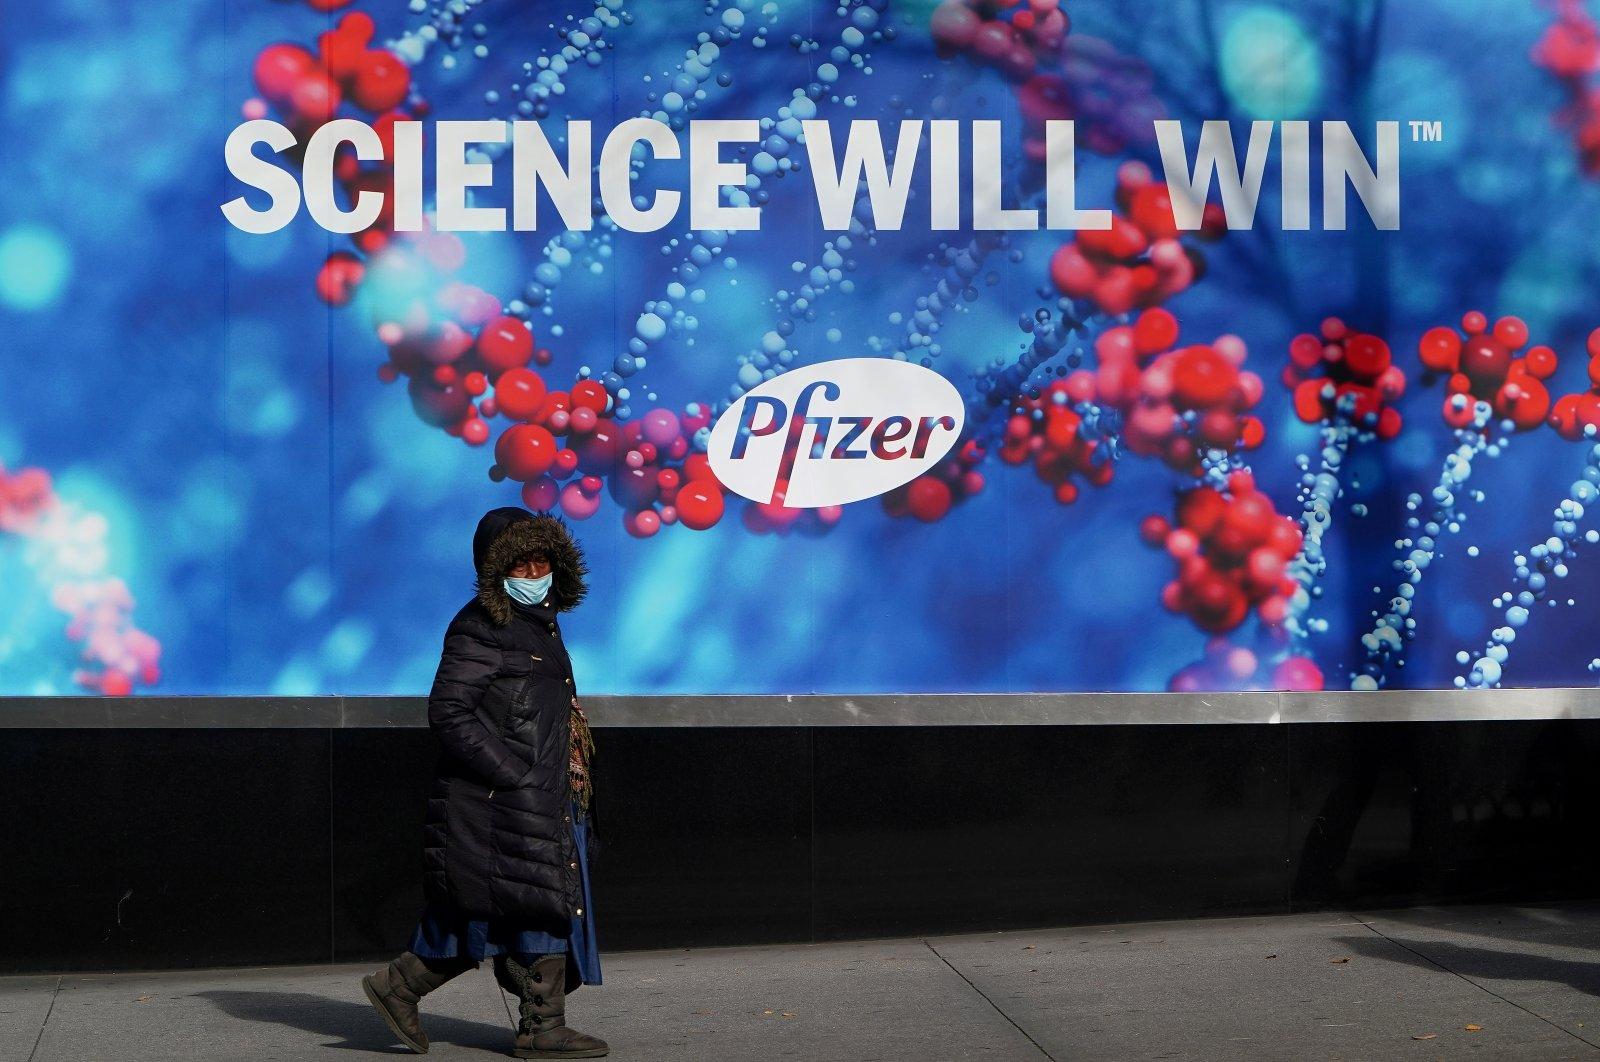 A person walks past the Pfizer Headquarters building in the Manhattan borough of New York City, New York, U.S., Dec. 7, 2020. (Reuters Photo)